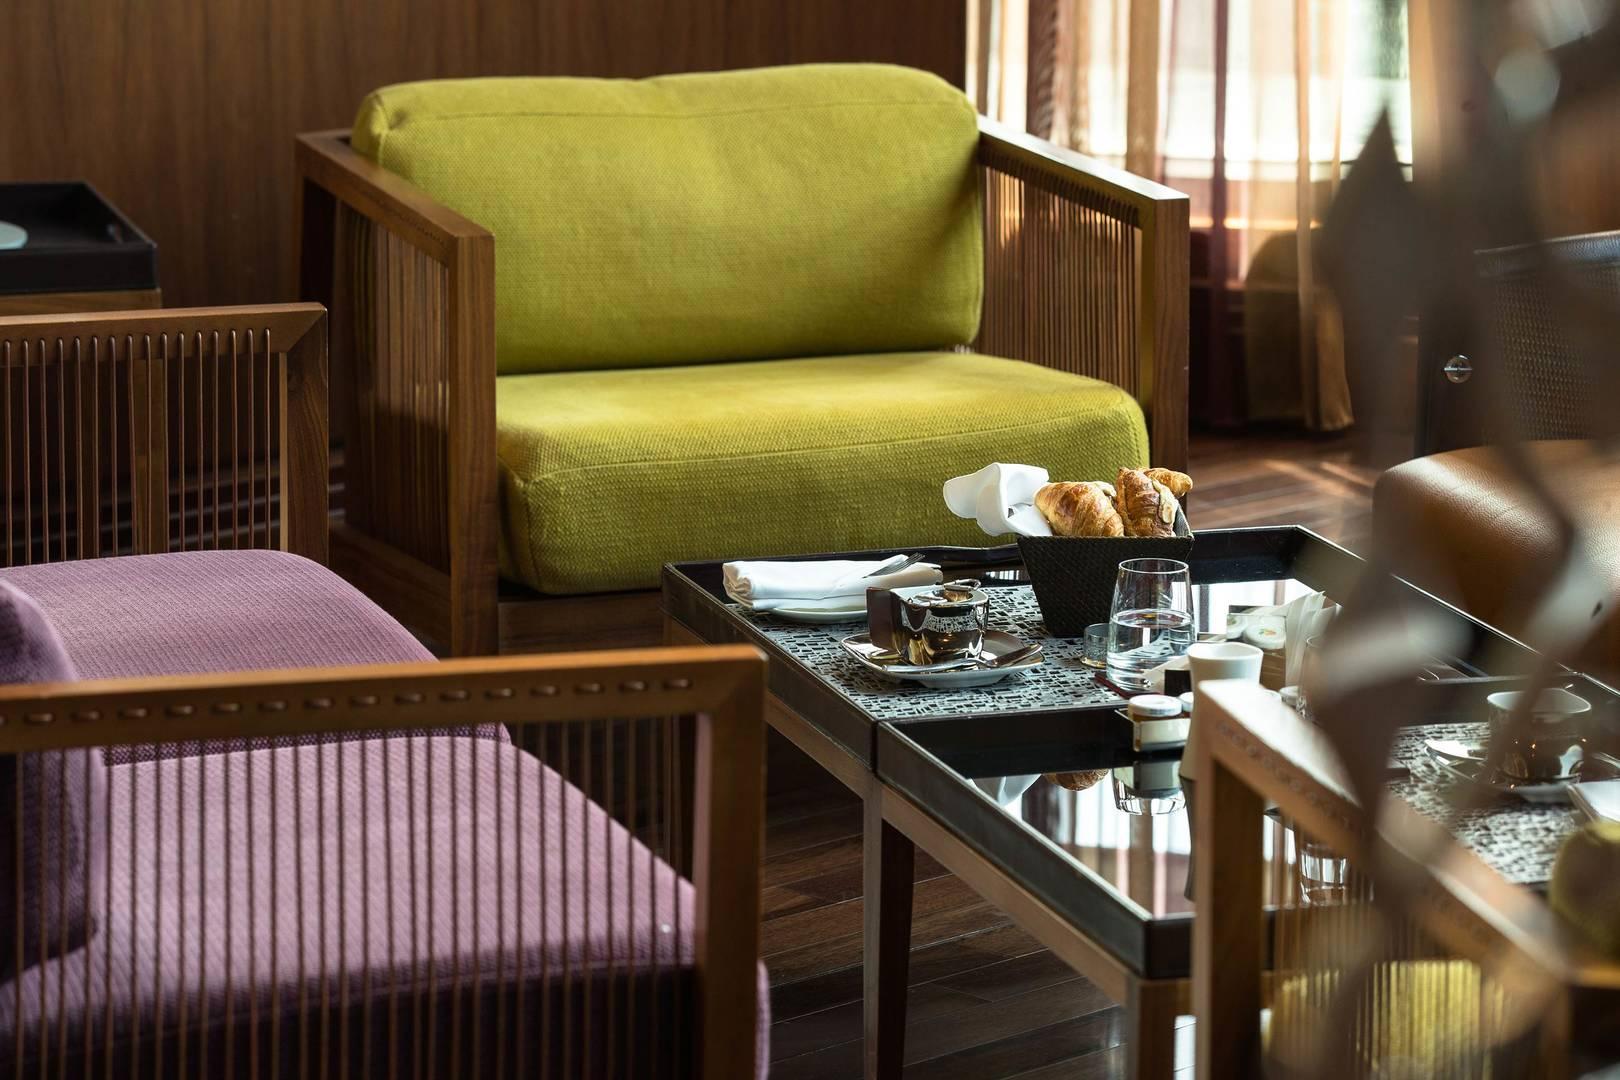 https://cdn.jumeirah.com/-/mediadh/DH/Hospitality/Jumeirah/Restaurants/Dubai/Creekside-Hotel-Crimson-Gallery/Restaurant-Gallery/Highresolution300dpiJumeirahCreeksideHotelCrimsonGallery164.jpg?h=1080&w=1620&hash=A59B1AEAD6307F0AF661C41BD51F57C3